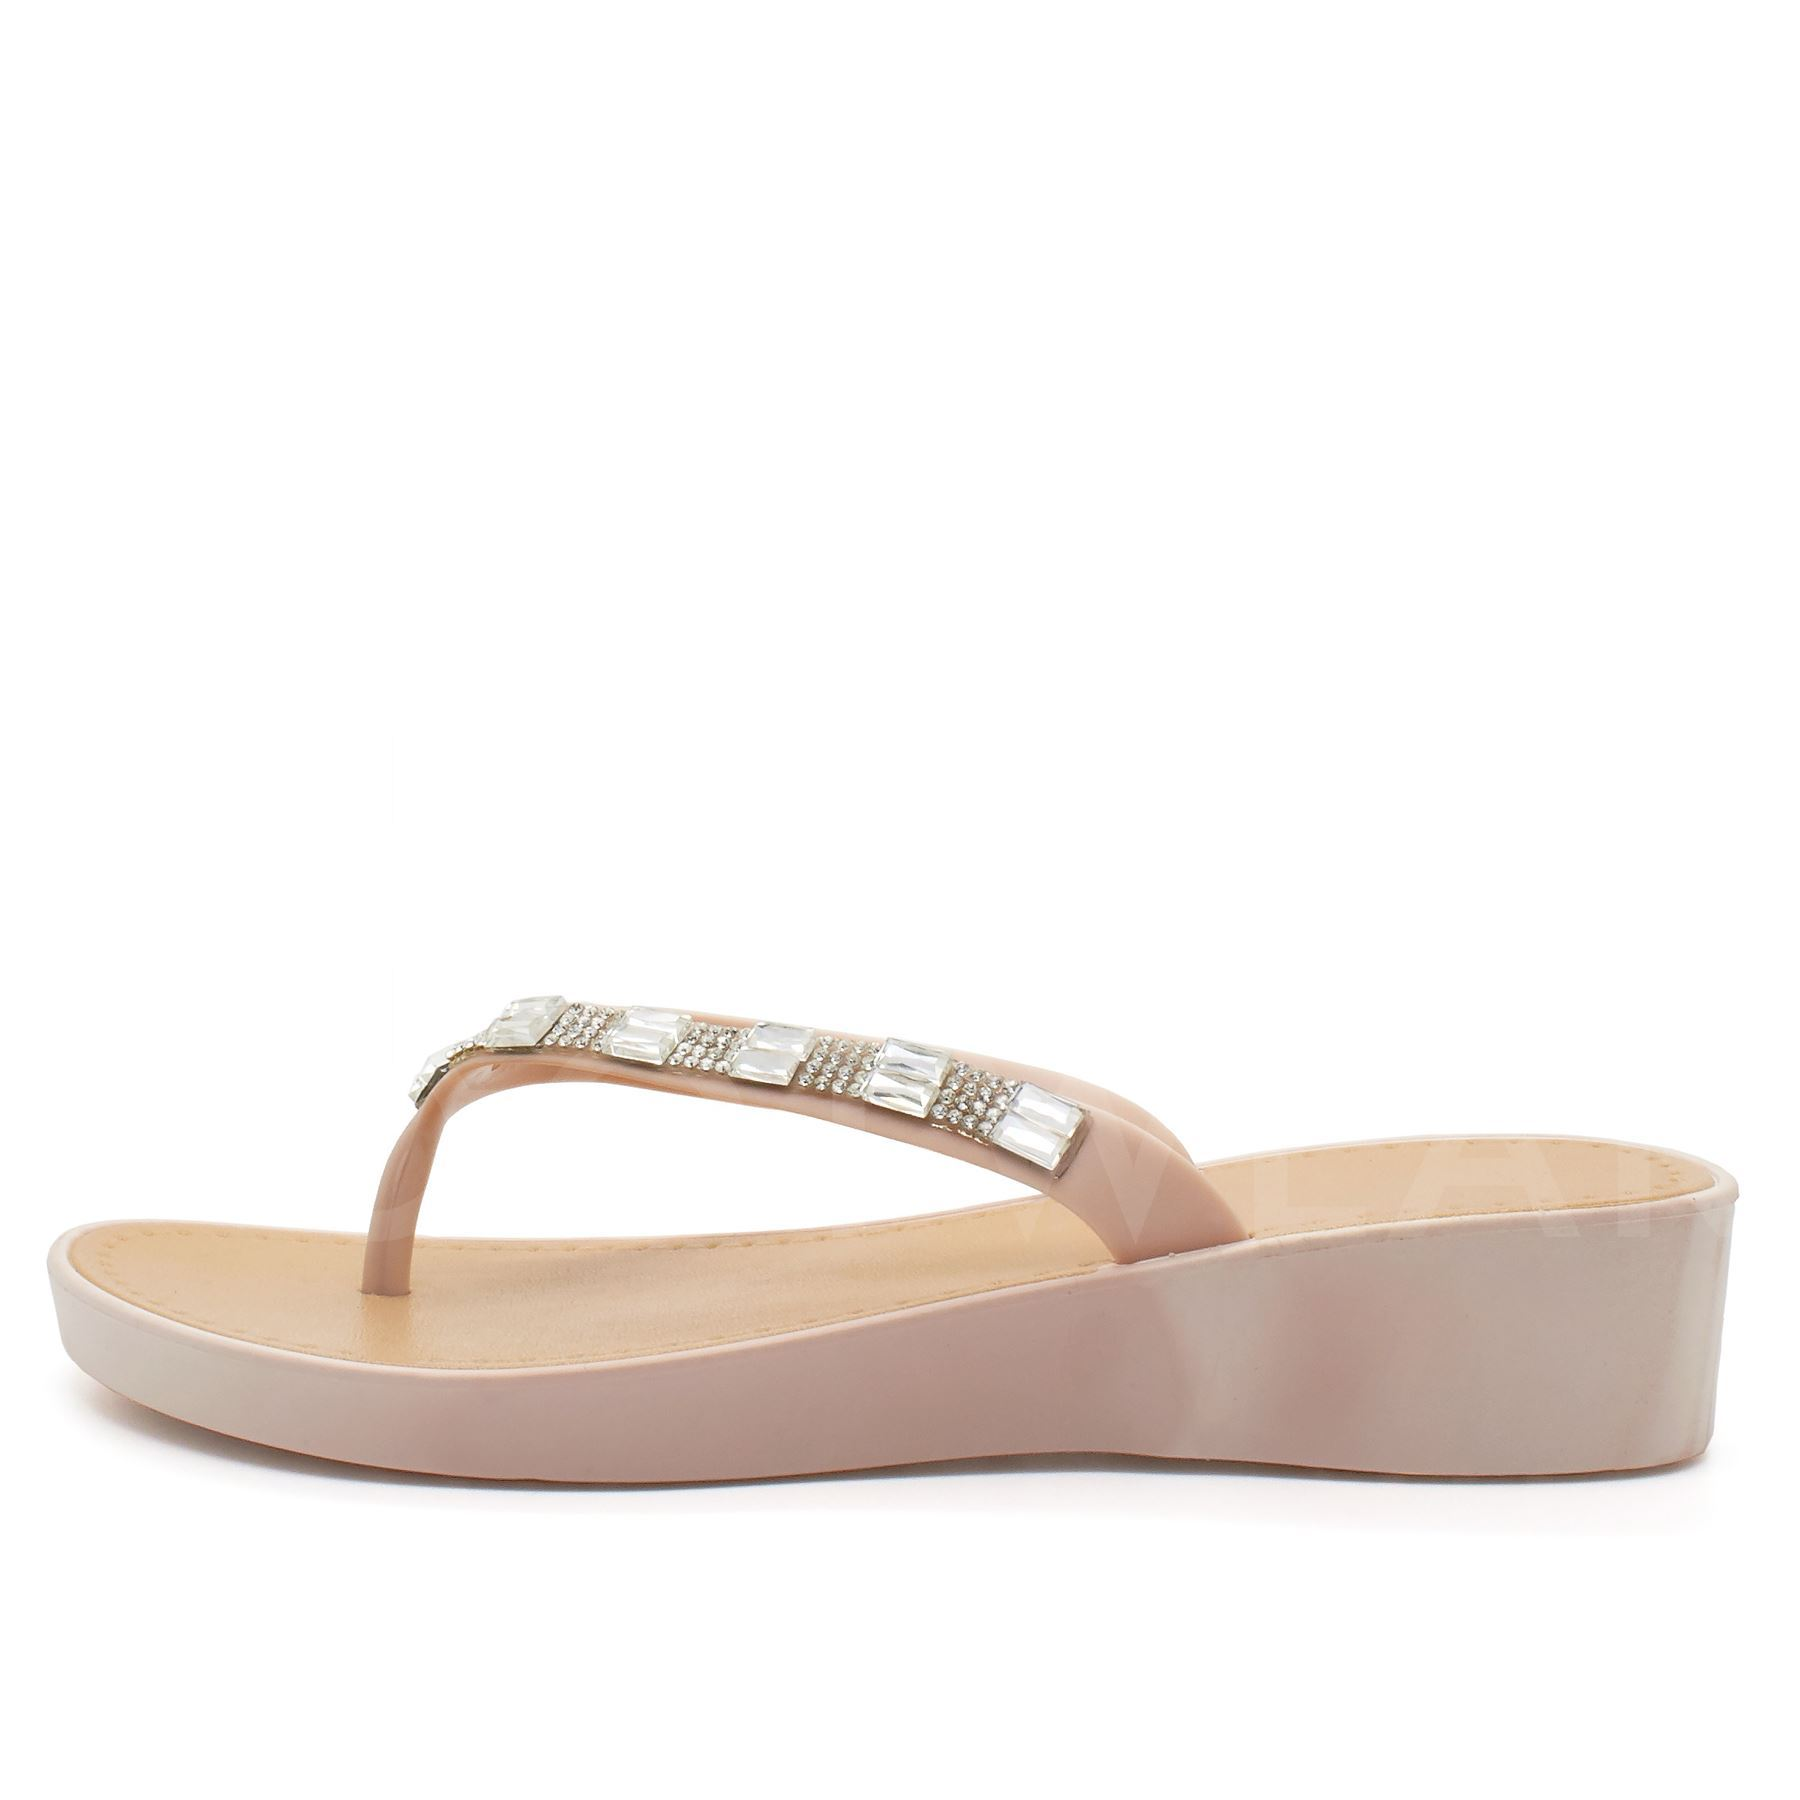 New Womens Low Wedge Heel Sandals Ladies Diamante Flip -3433